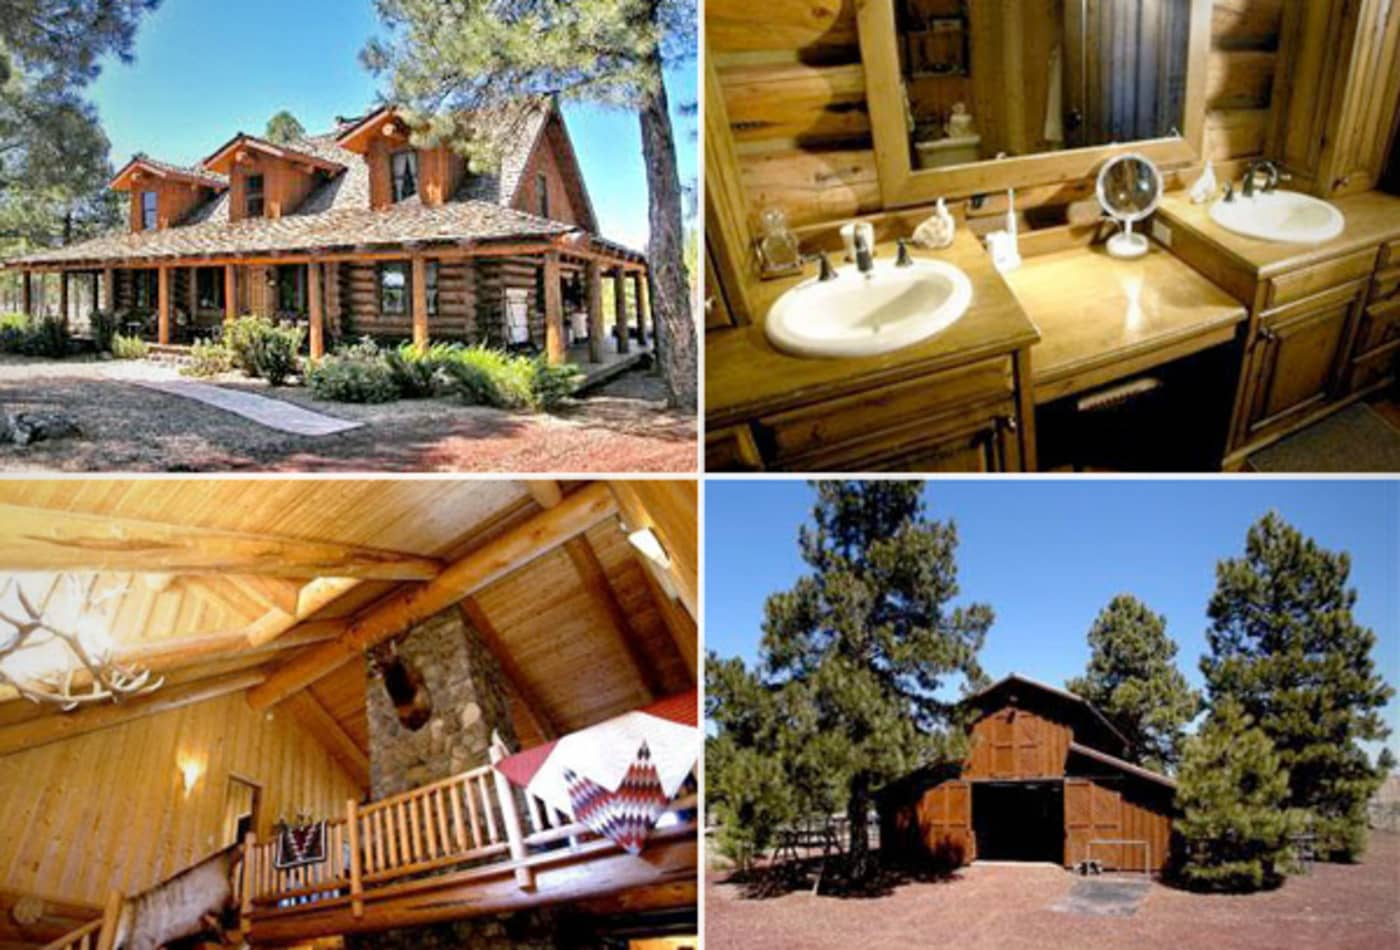 CNBC_luxurious_log_cabins_arizona.jpg